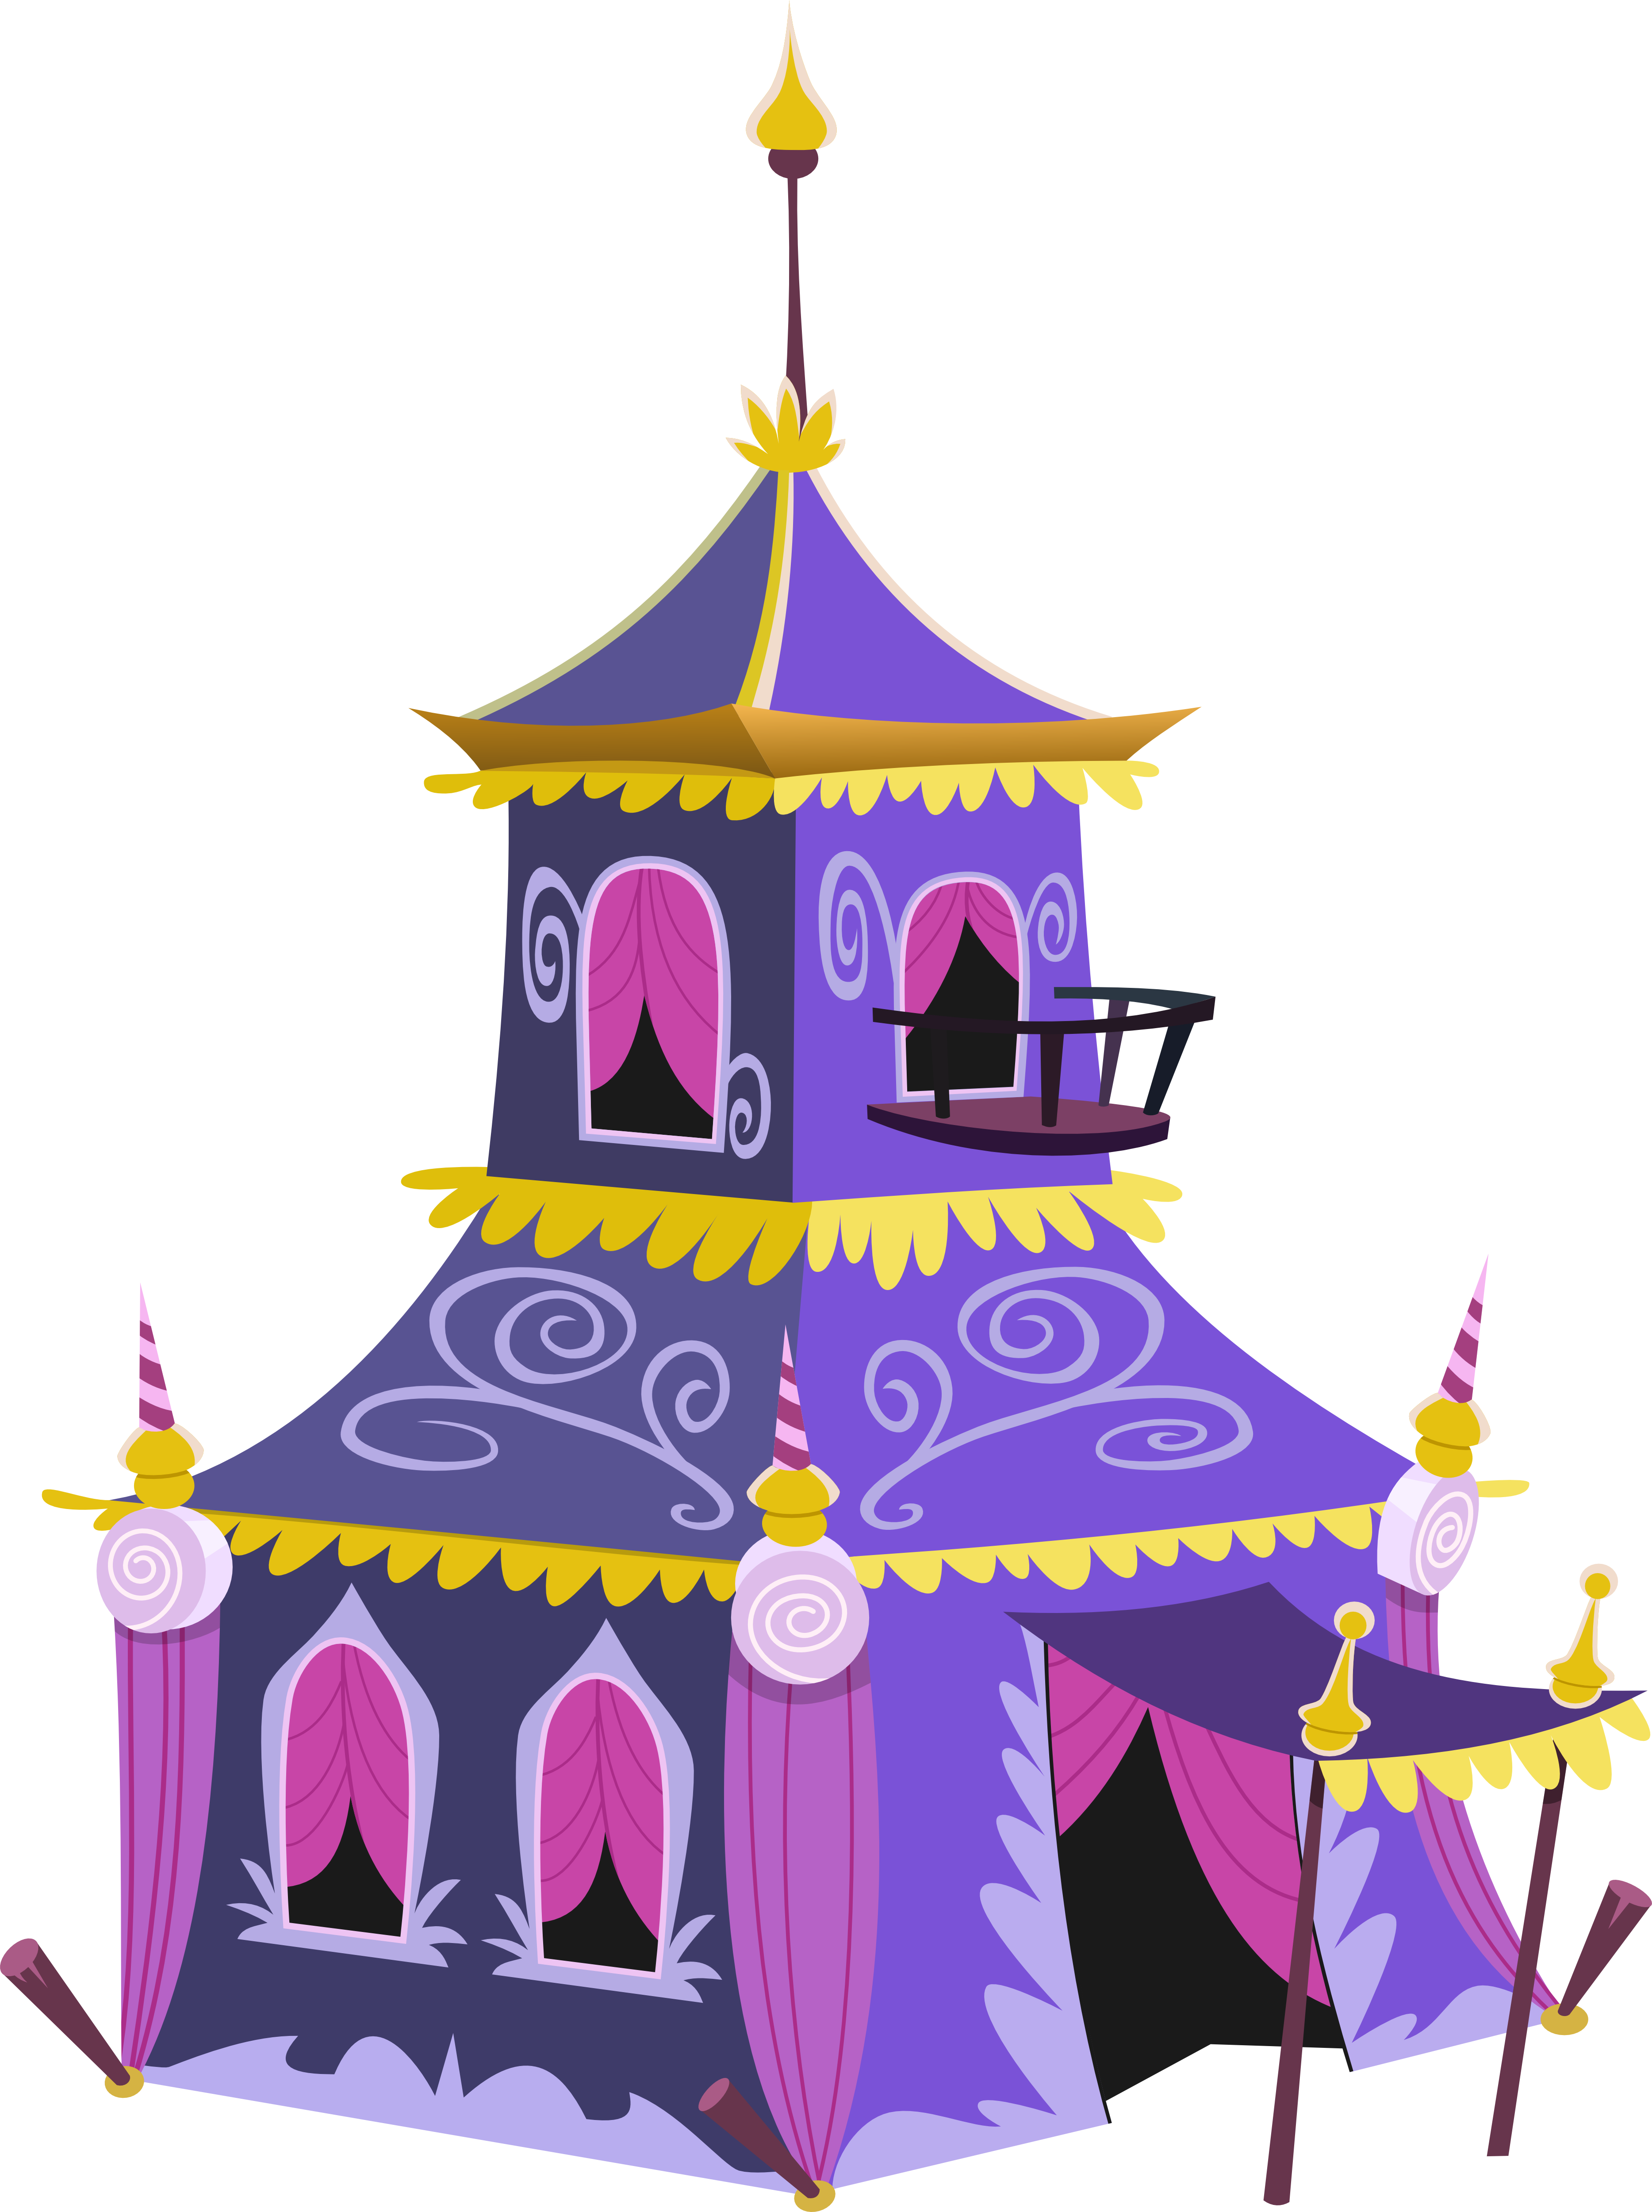 Rarity's Tent